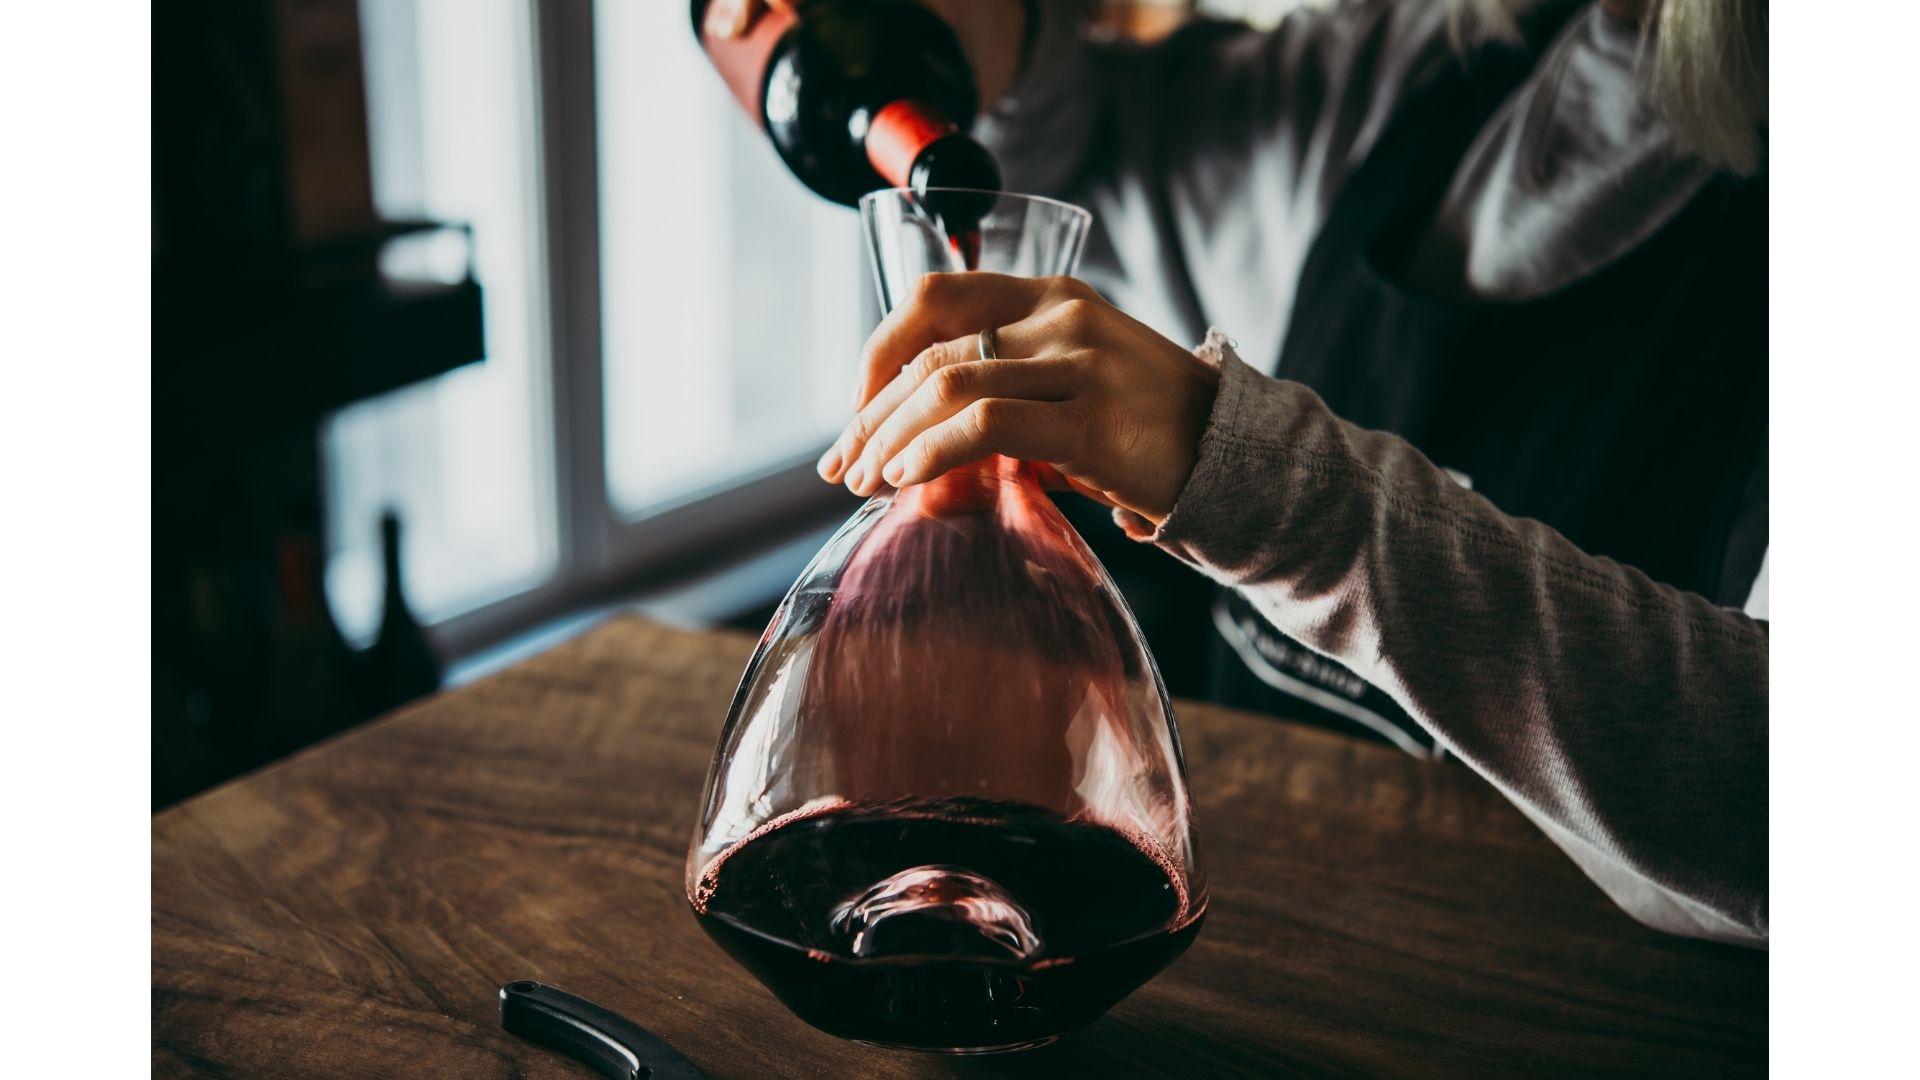 Wine Tips: Wine Aeration - Letting Wines Breathe